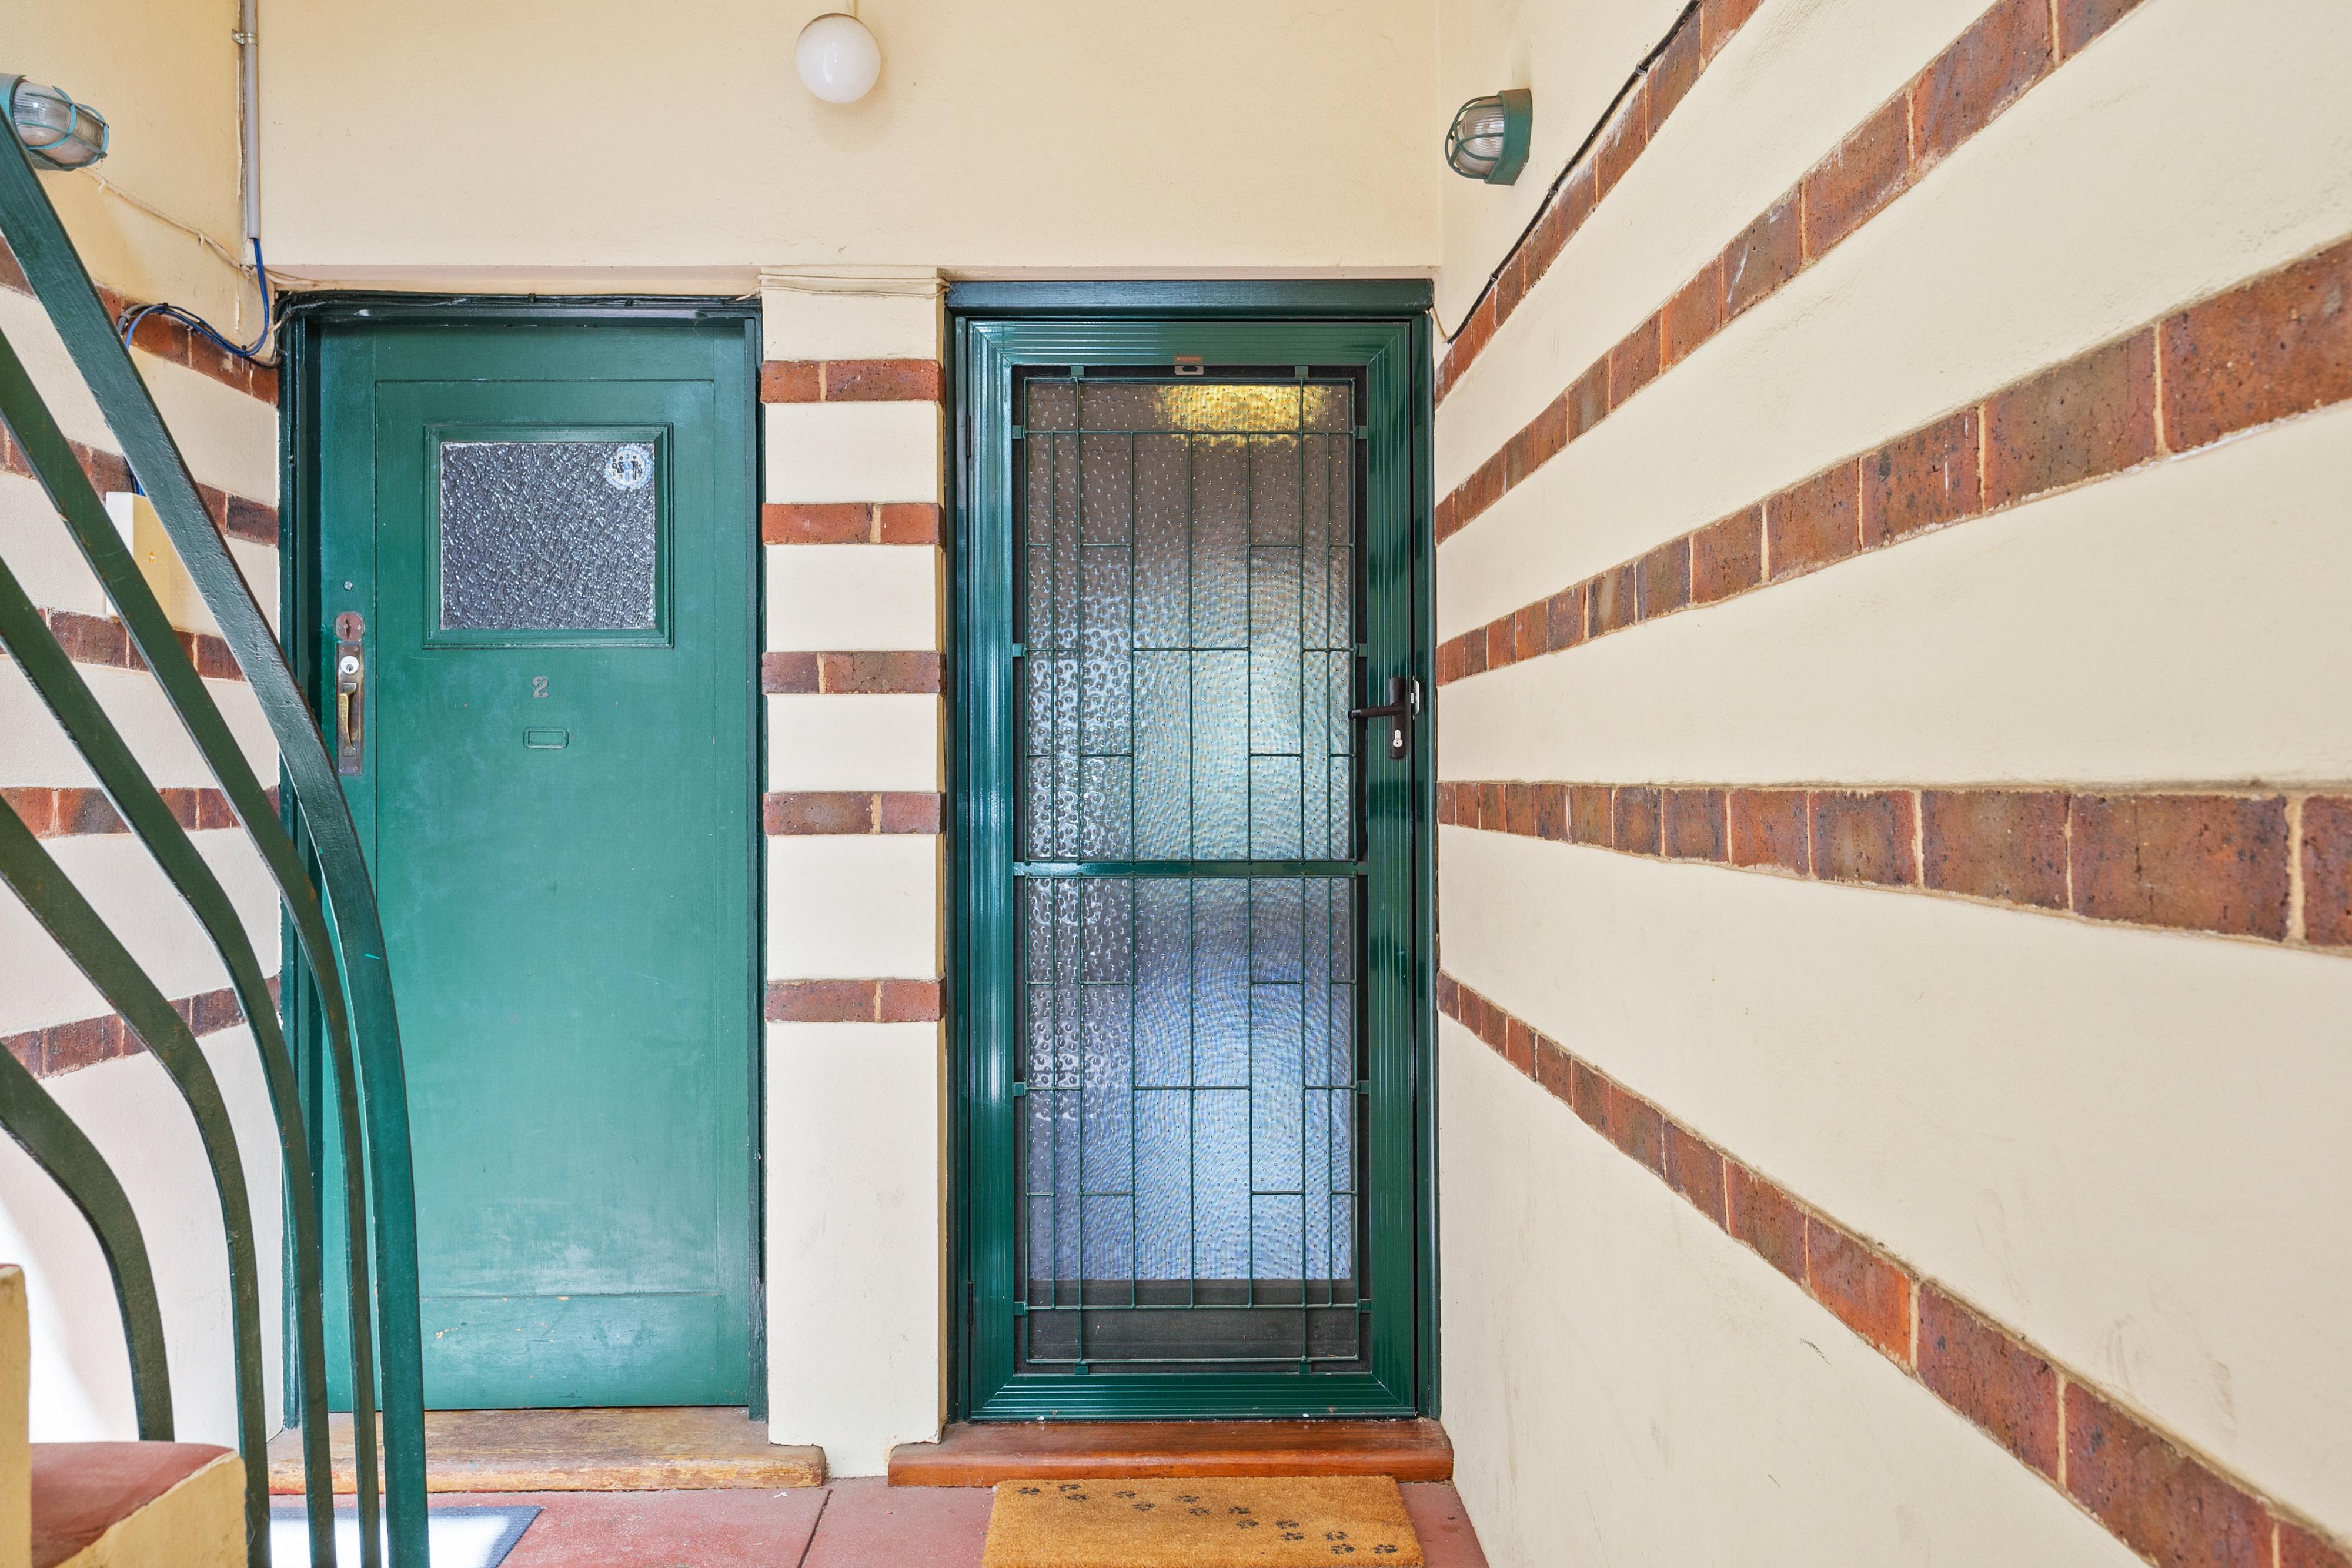 PRINT 1 83 Carr Street, West Perth 28